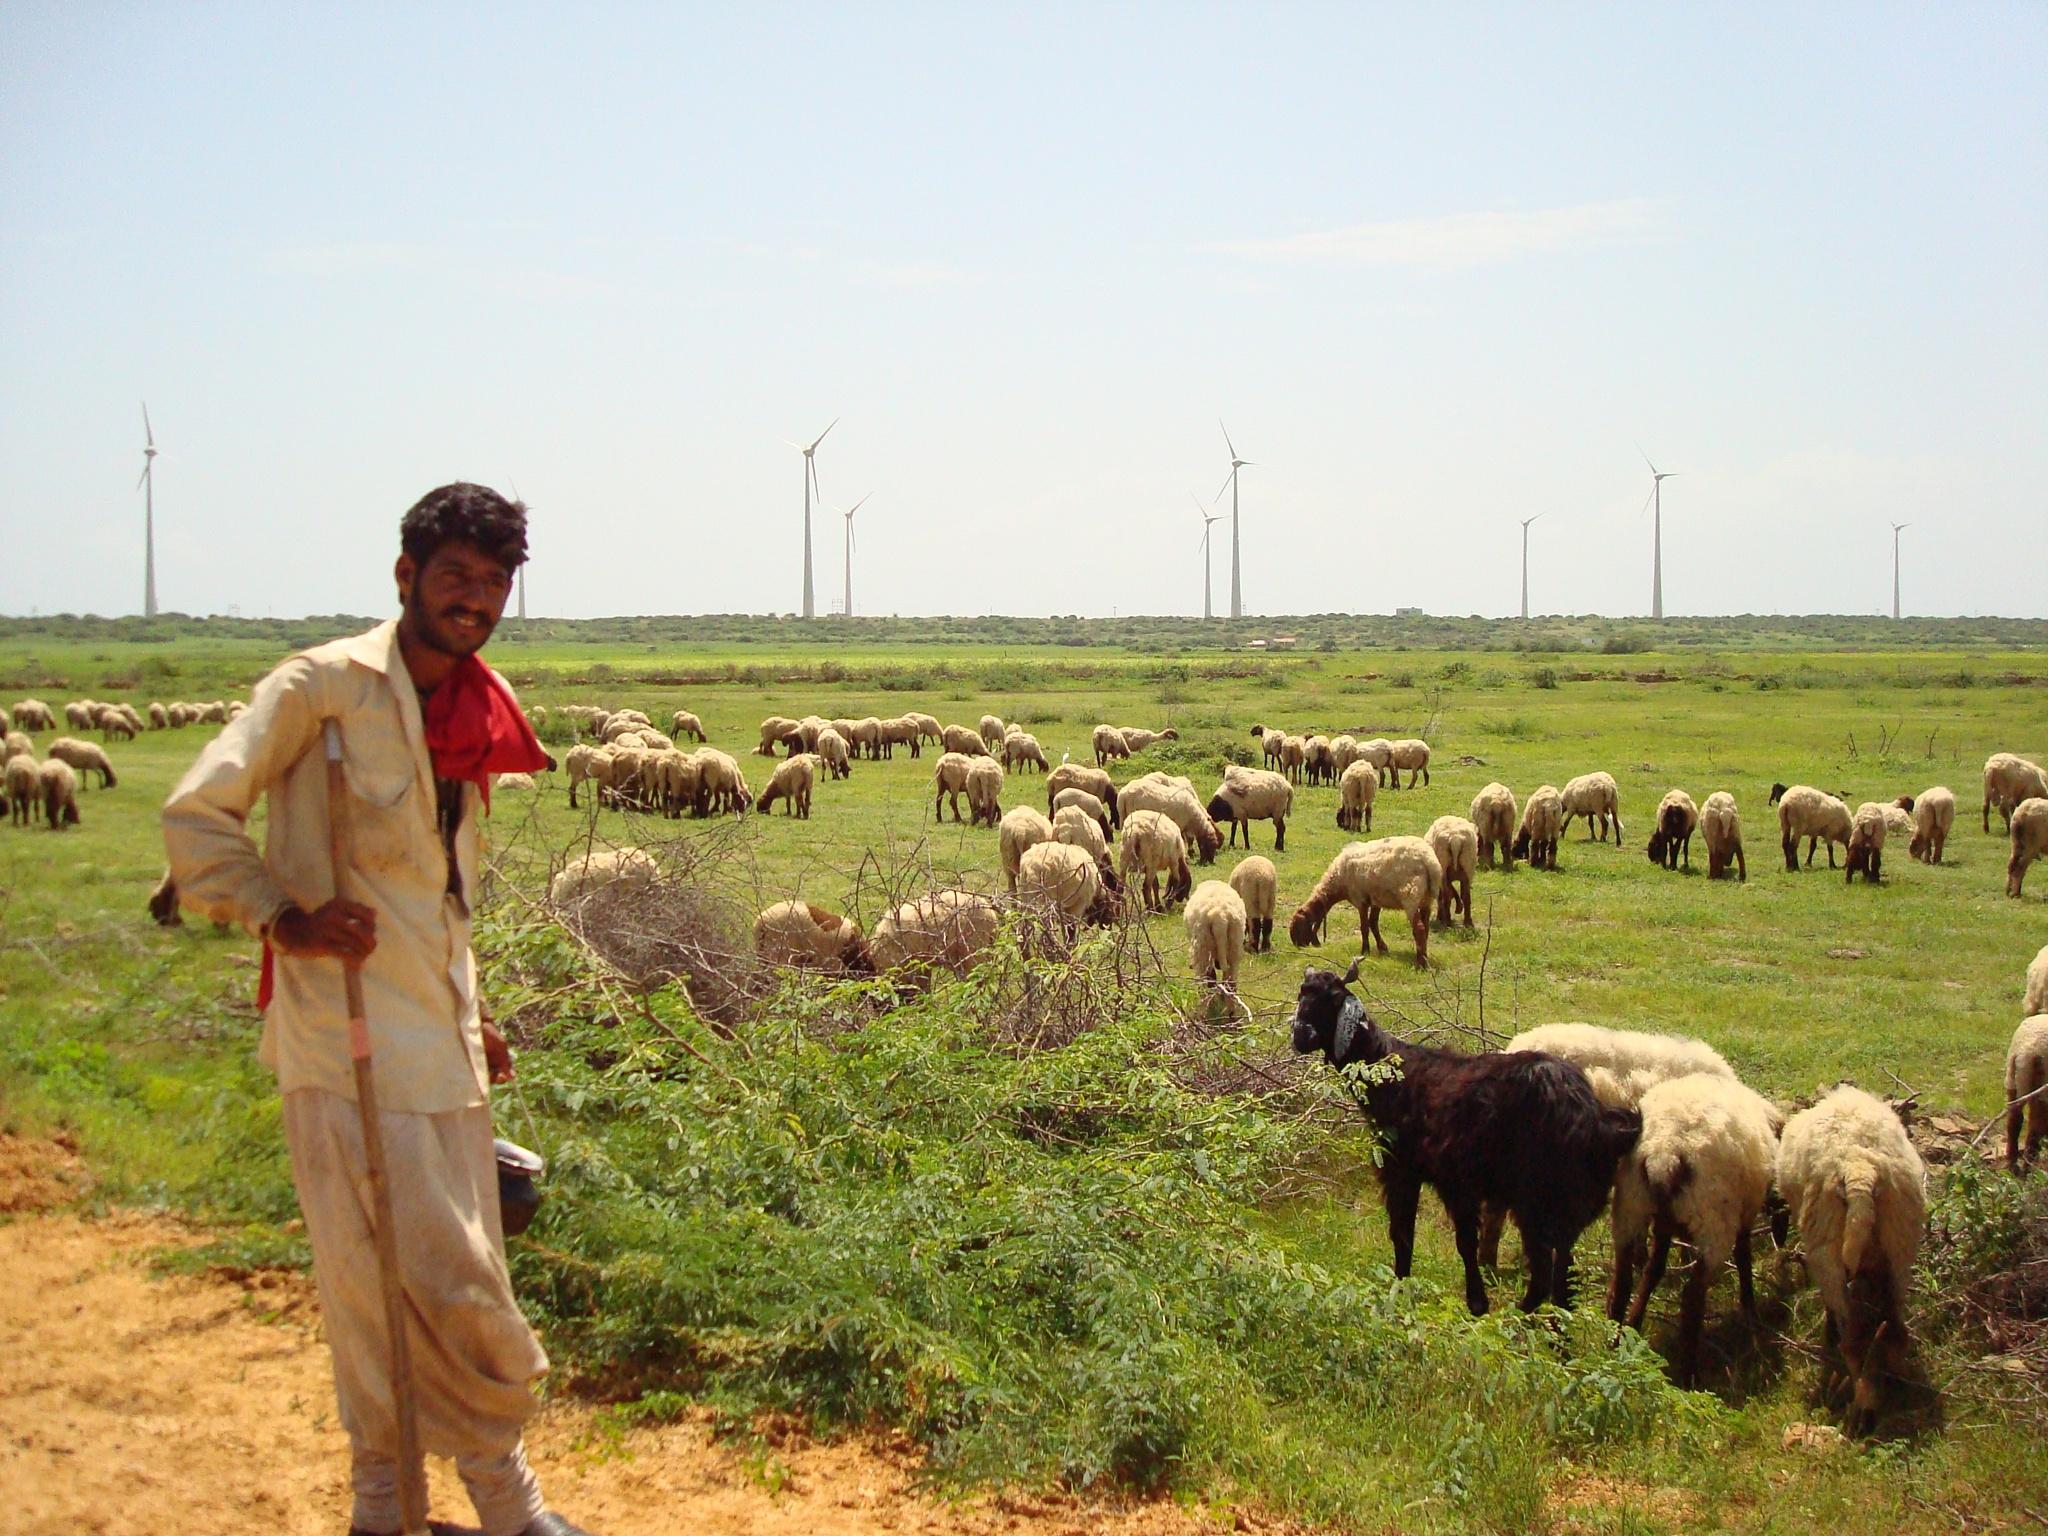 Farmer with his live stock by Shrenik Dodhia